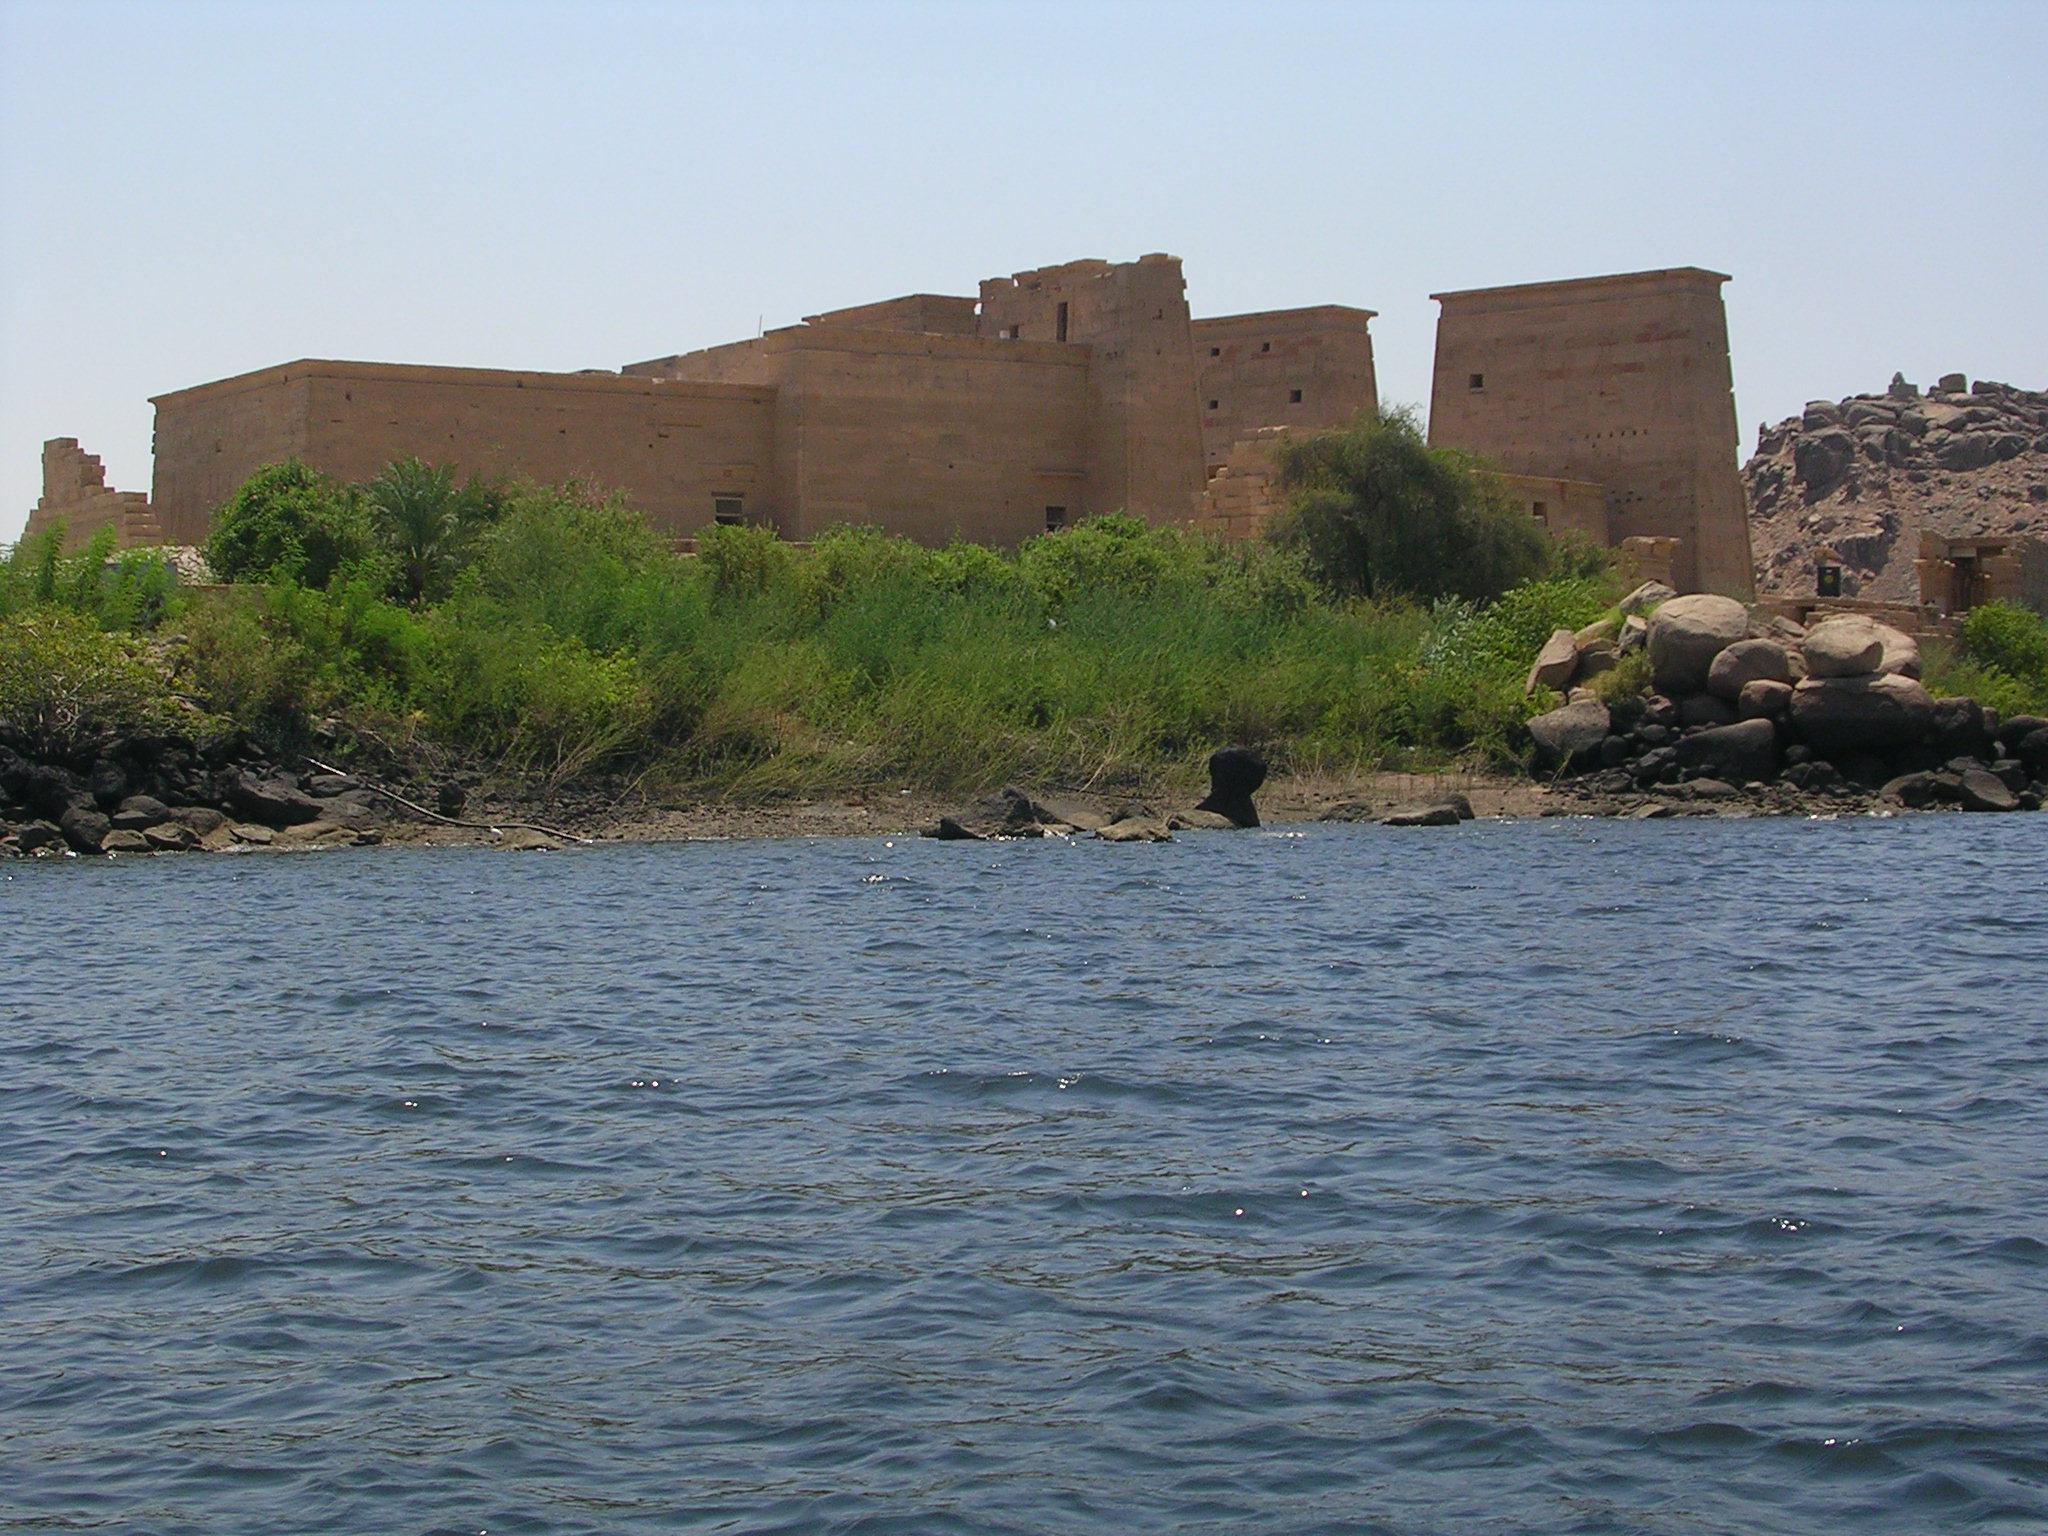 Egypt, Abu, Africa, Ancient, Antique, HQ Photo